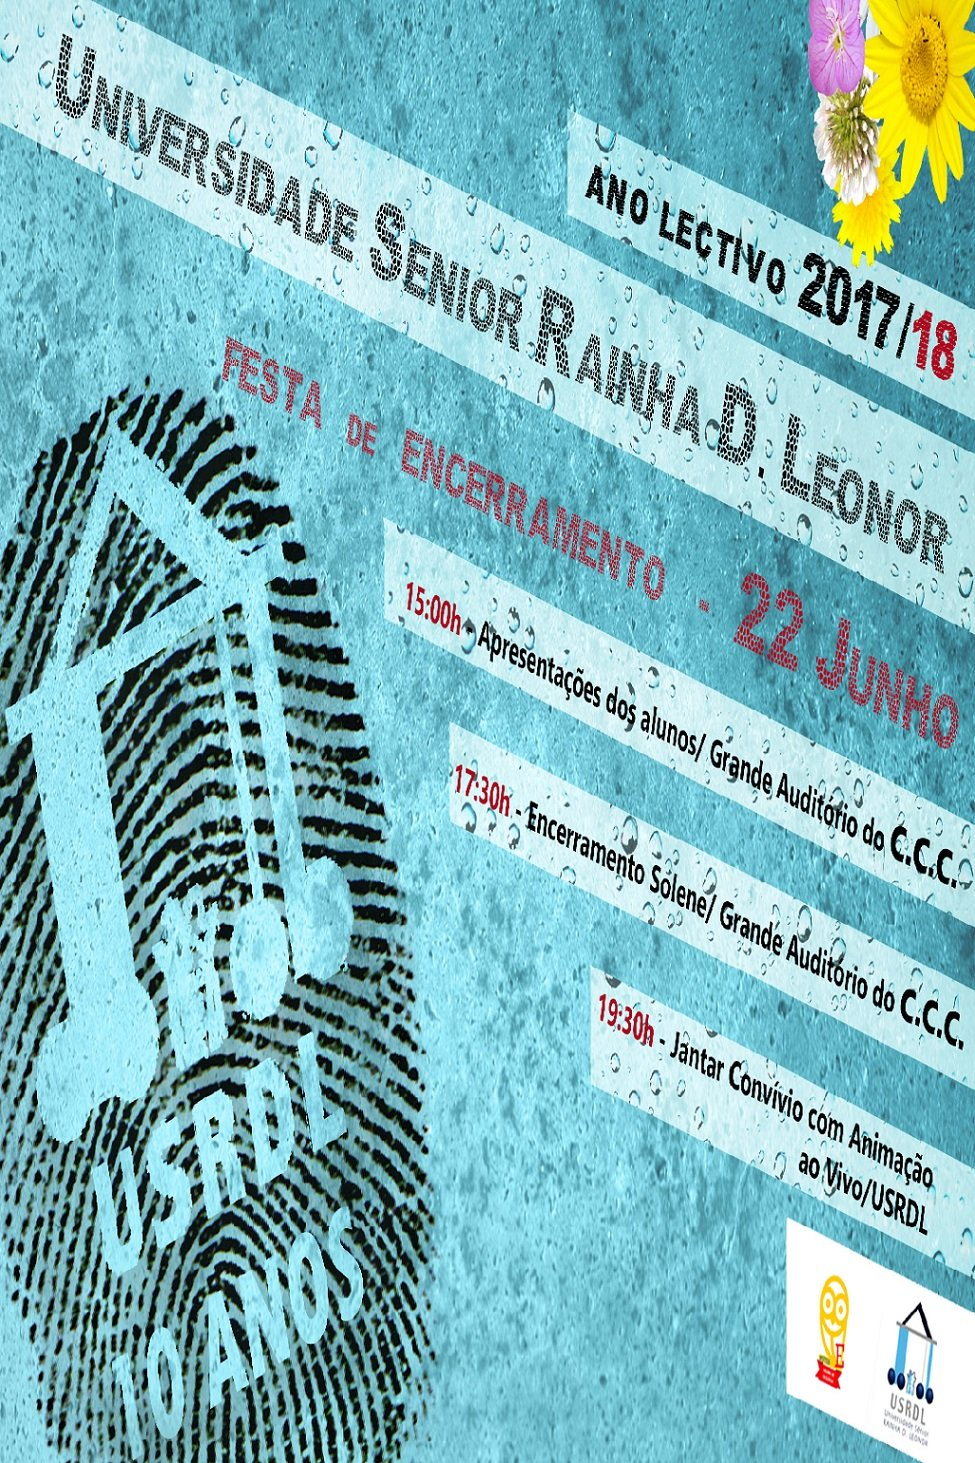 Festa de Encerramento da Universidade Sénior